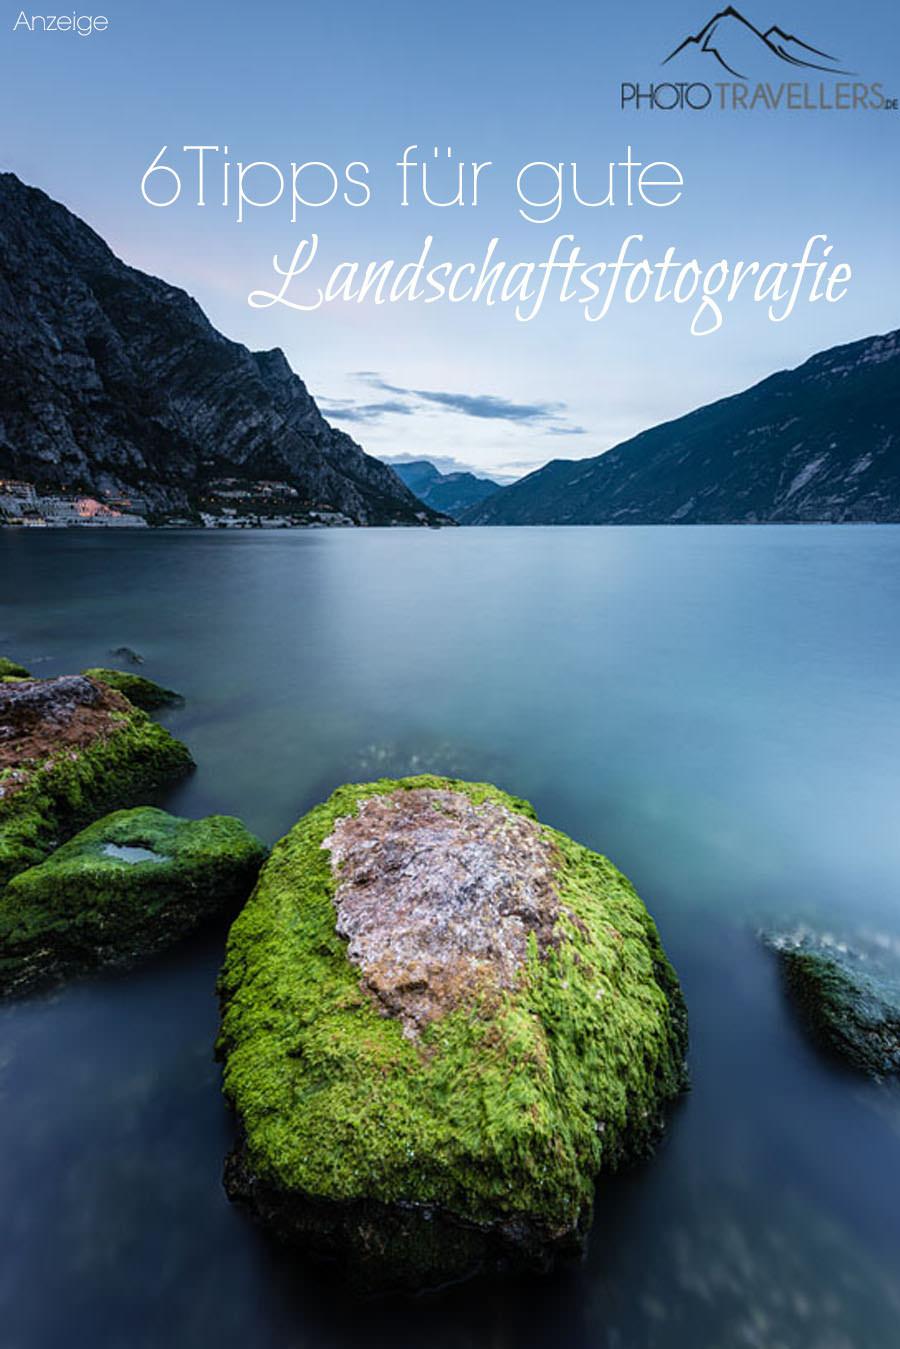 6 Tipps fuer gute Landschaftsfotografie Pinterest